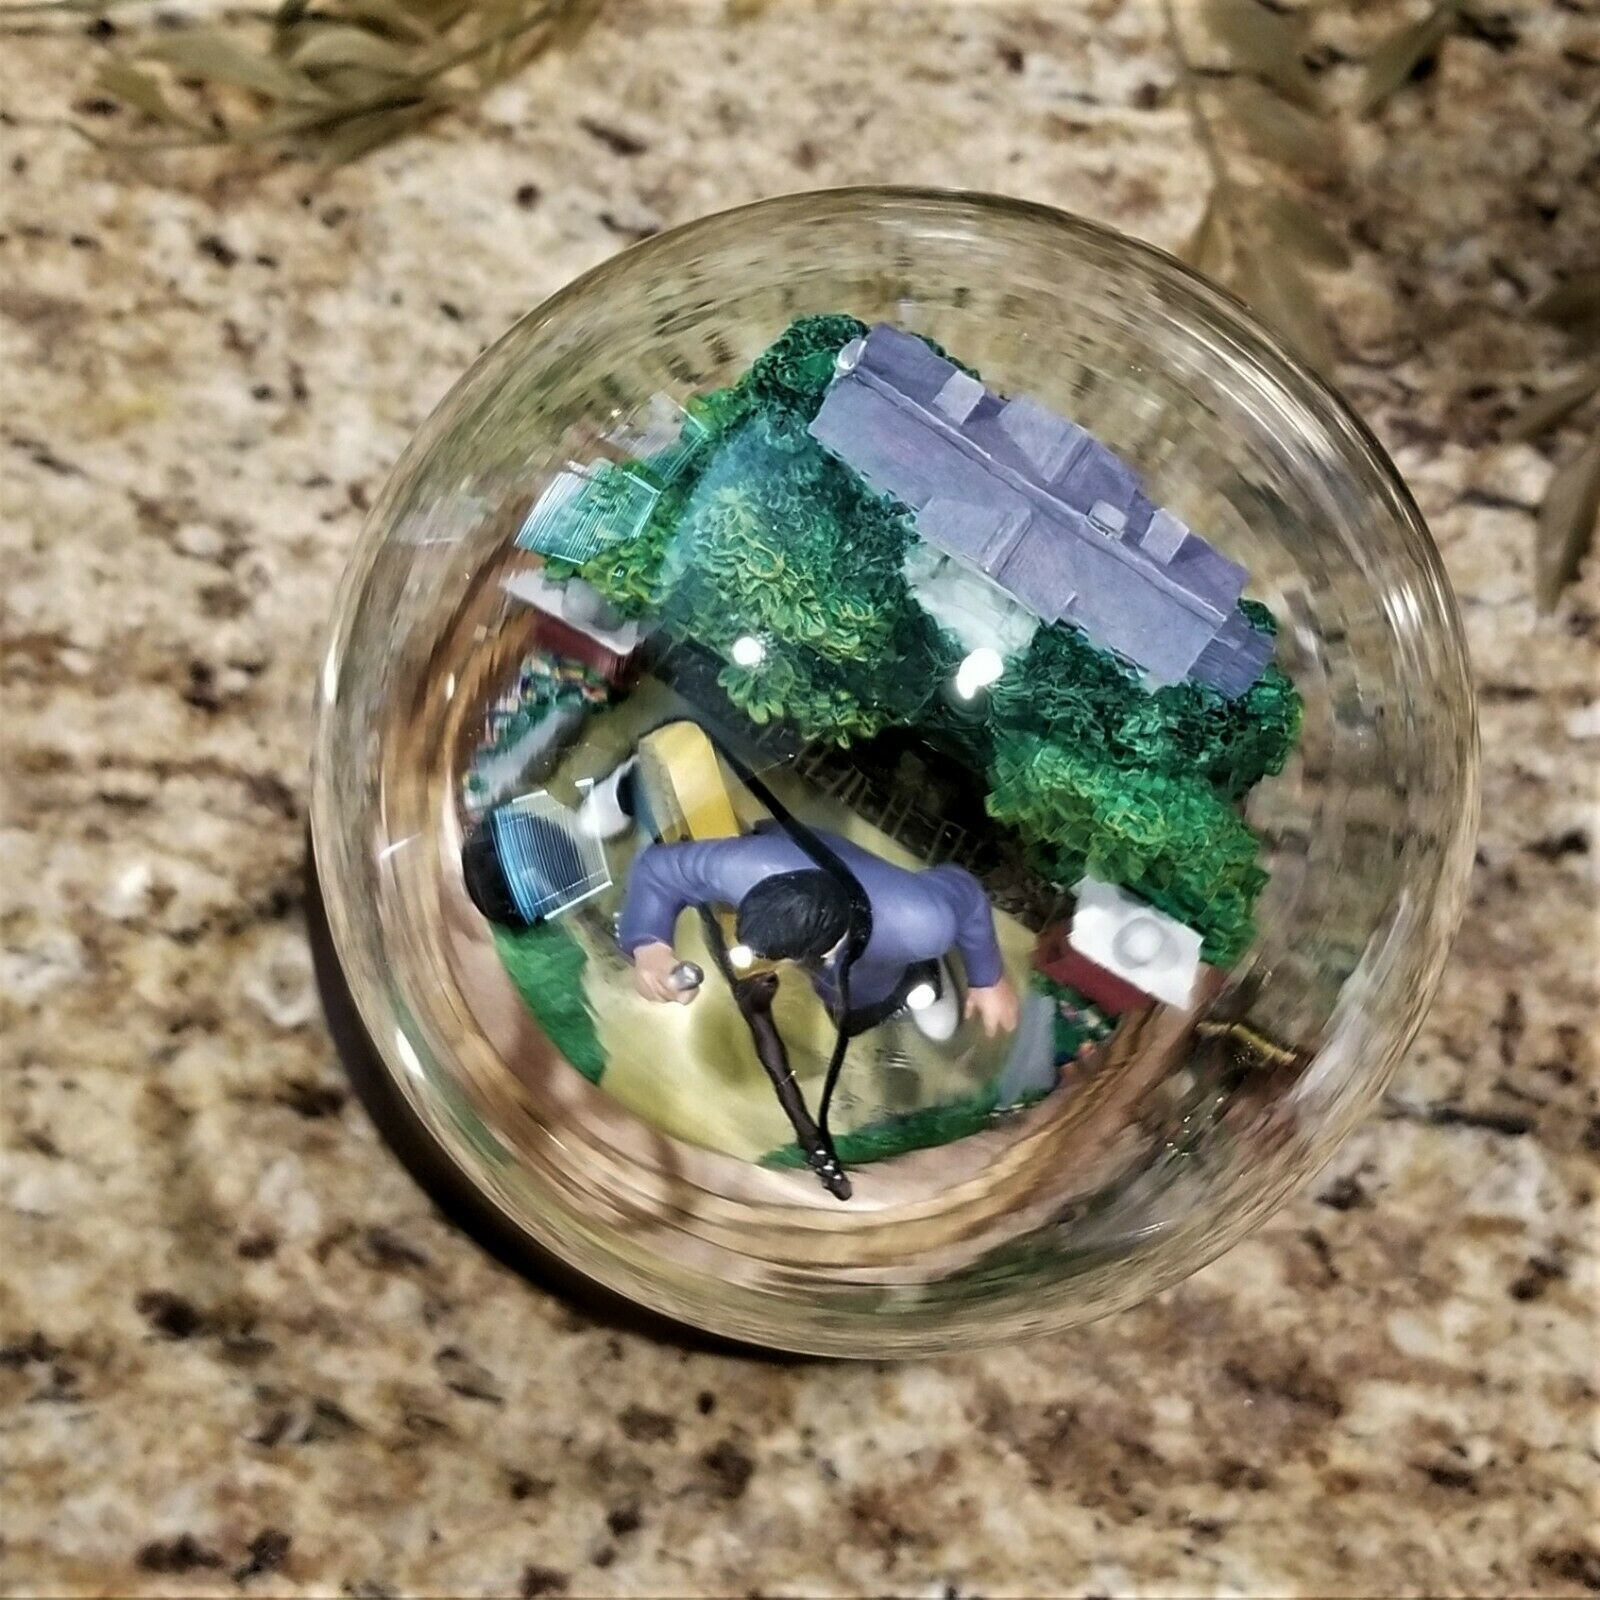 Franklin Mint Elvis Presley Graceland Love Me Tender Music Box Glass Dome Figure image 8